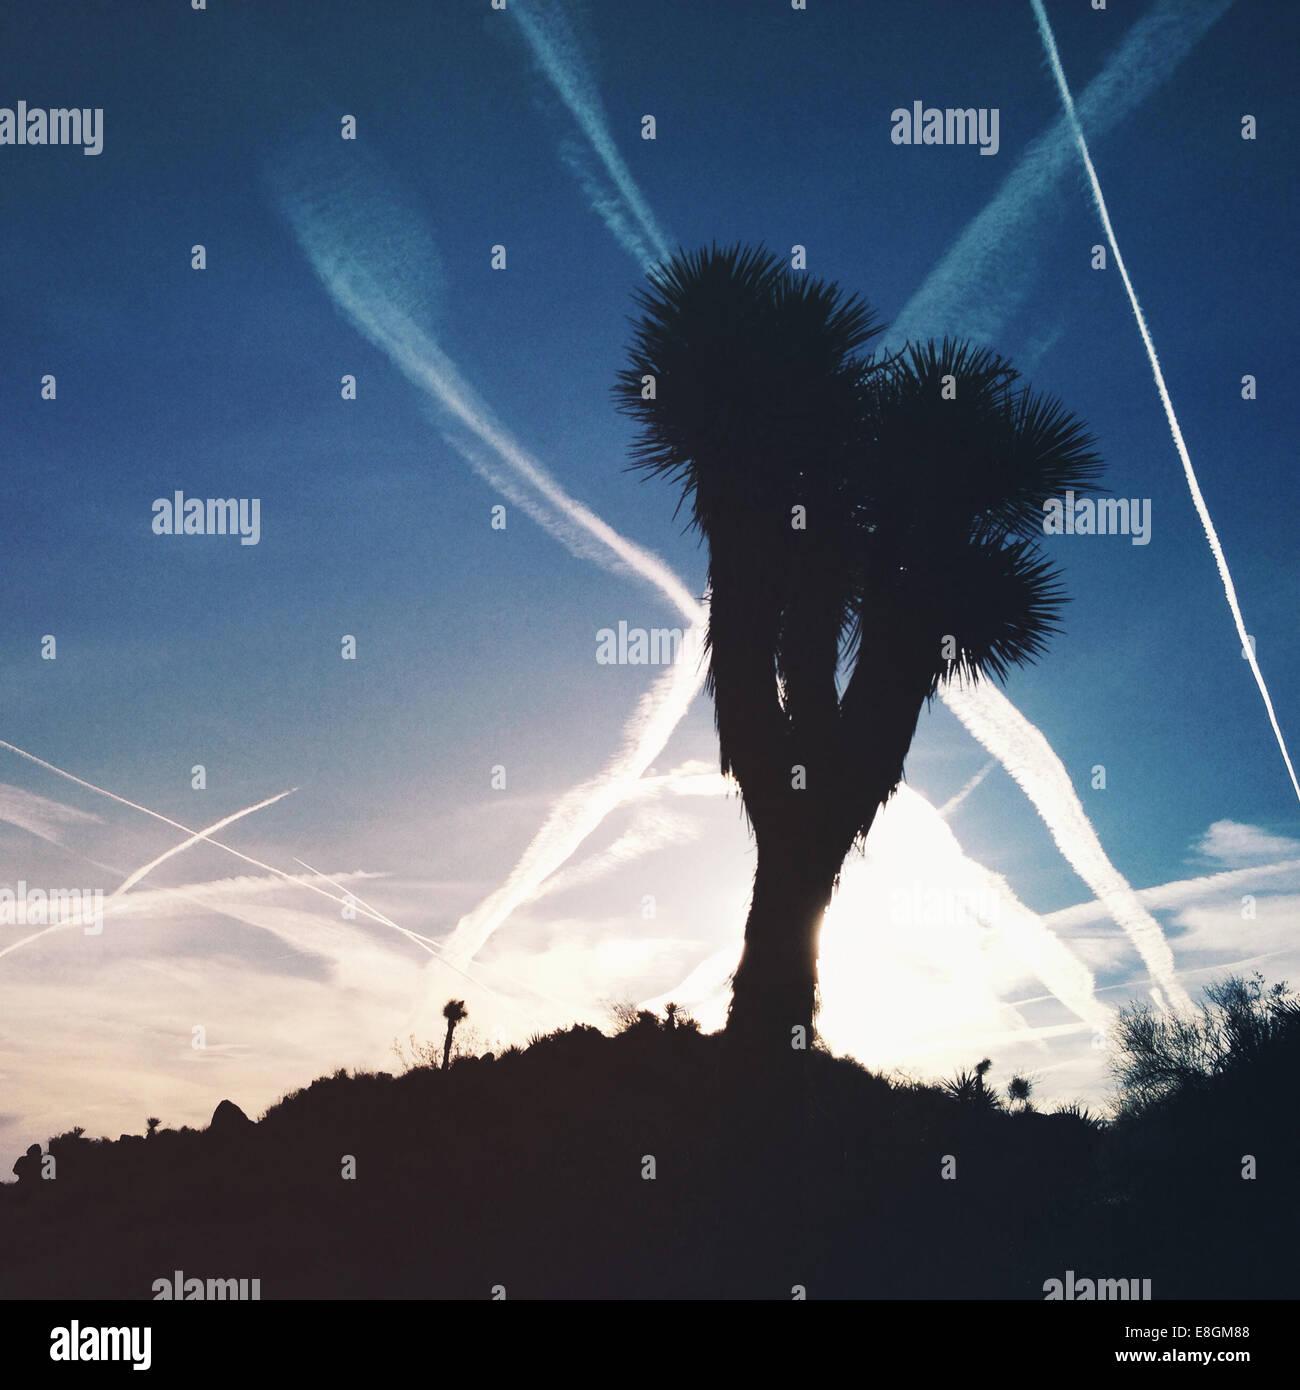 Silhouette des Joshua Tree, Joshua Tree Nationalpark, Kalifornien, Amerika, USA Stockbild